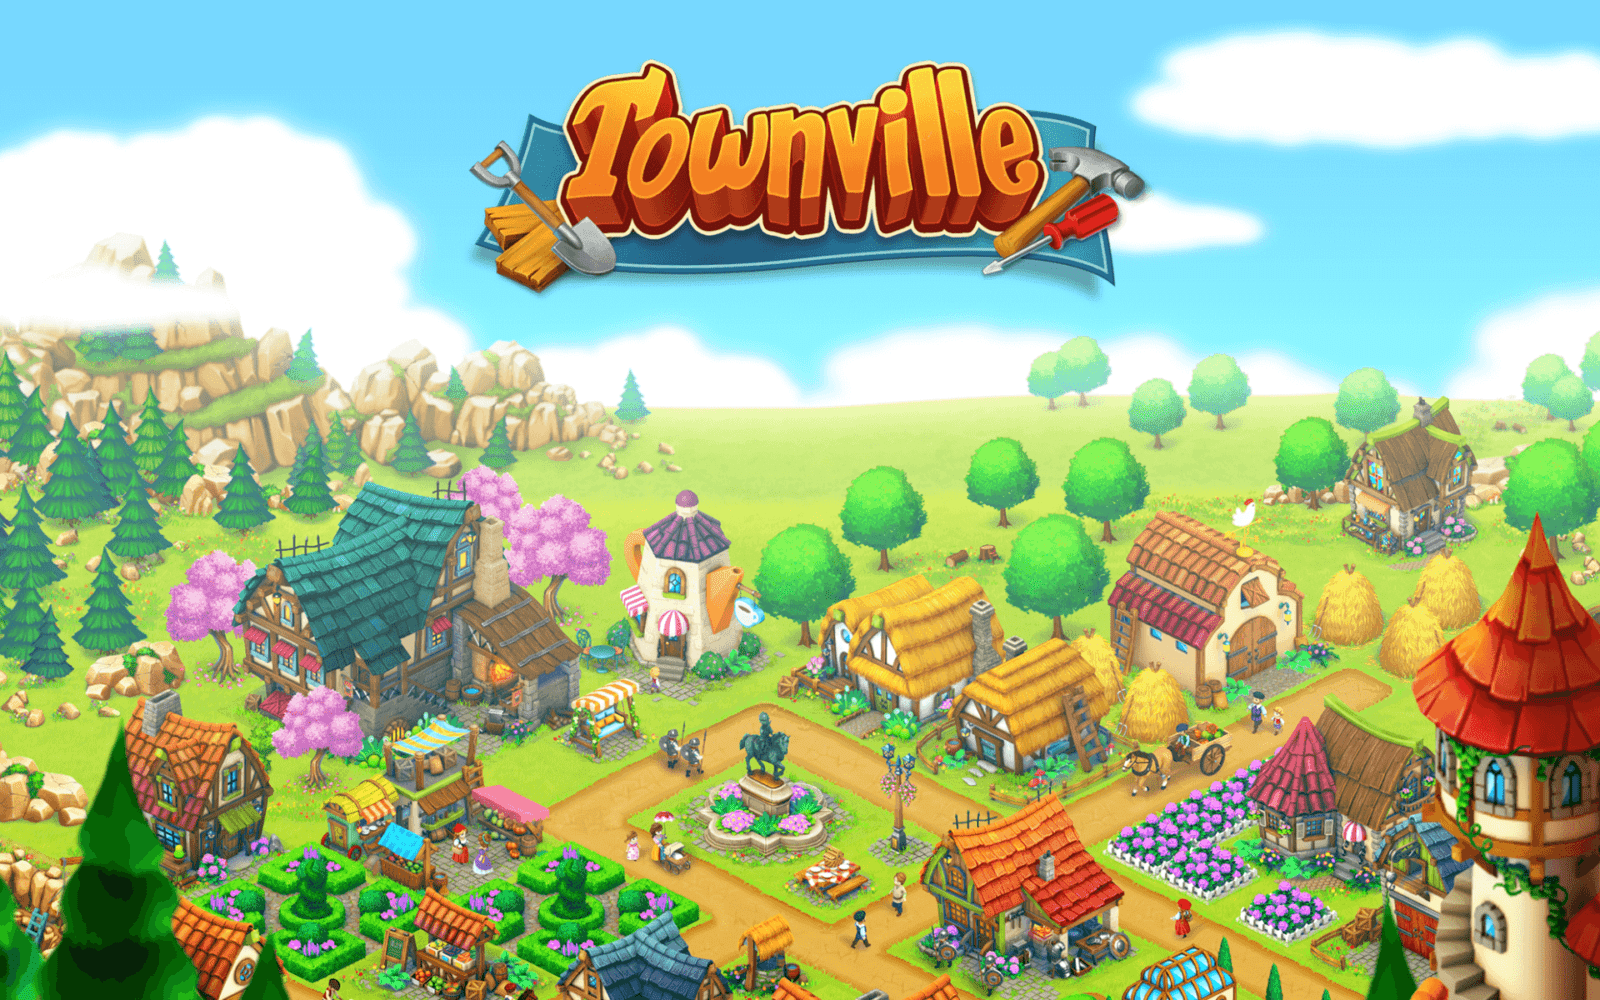 indigo.2017.townville.sparklingsociety.ss (1)